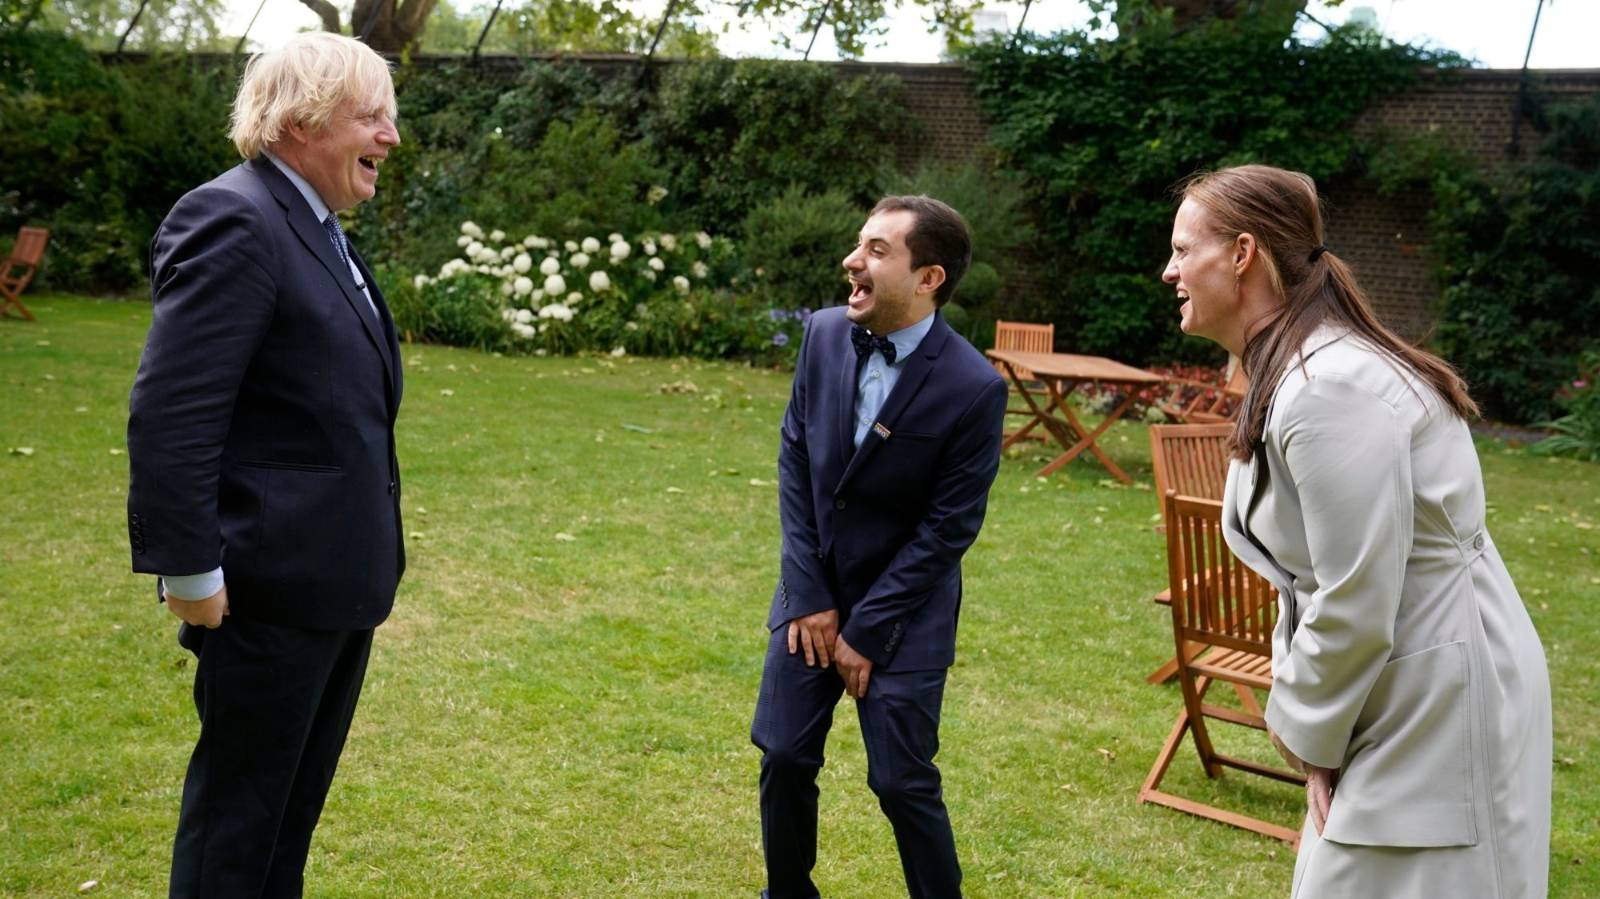 Kiwi nurse who cared for Covid-struck PM Boris Johnson quits